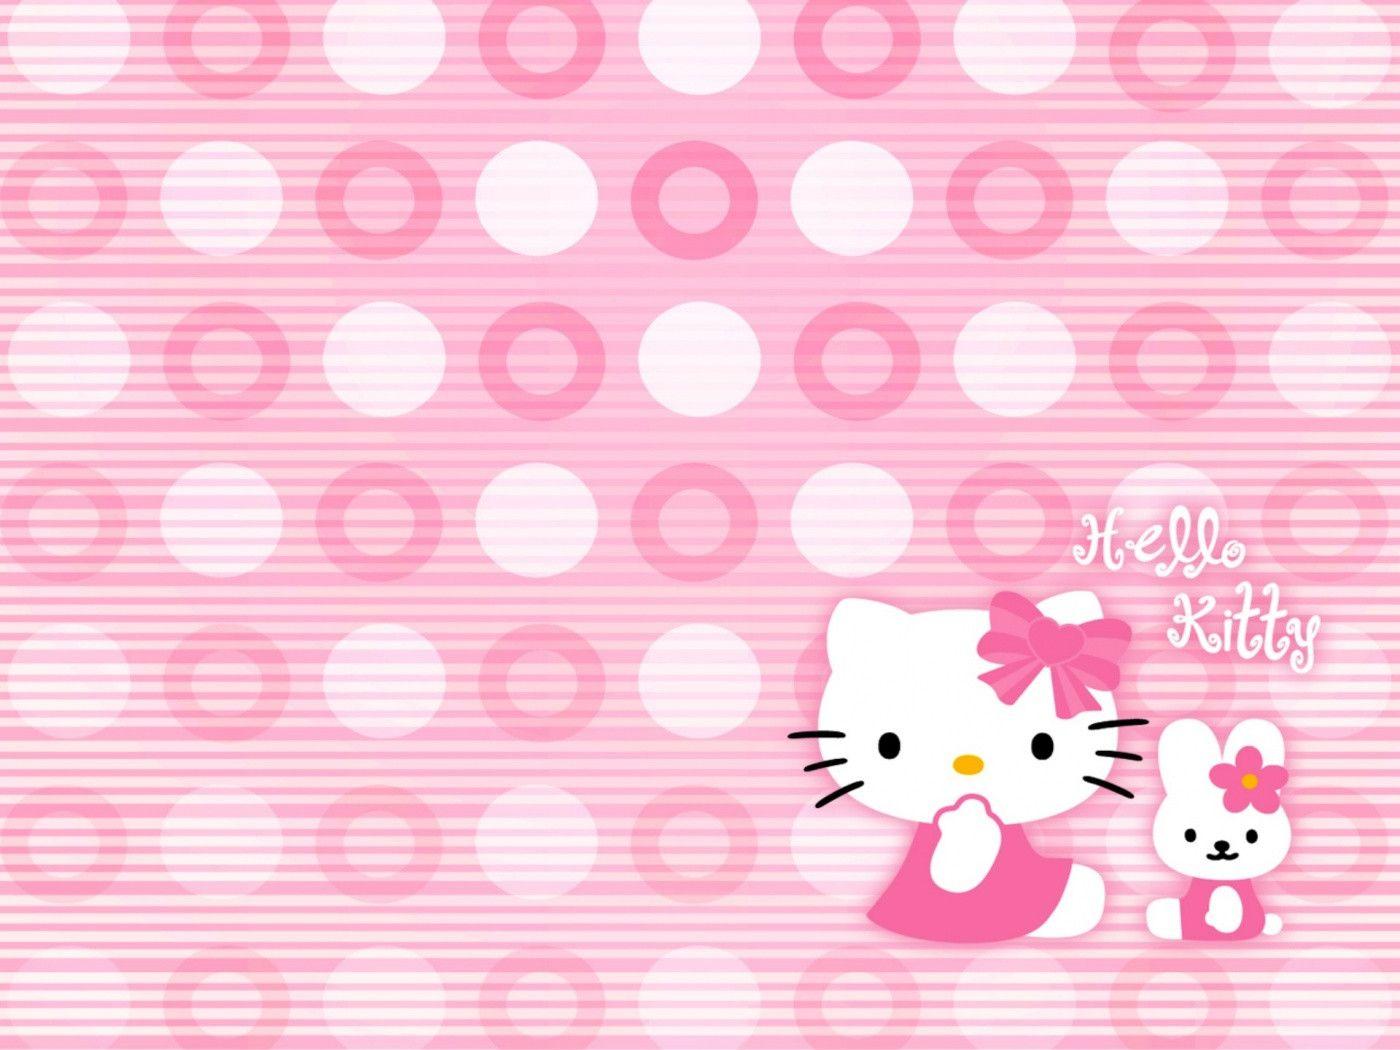 Hello Kitty Wallpapers Desktop 38980 HD Wallpapers | pictwalls.